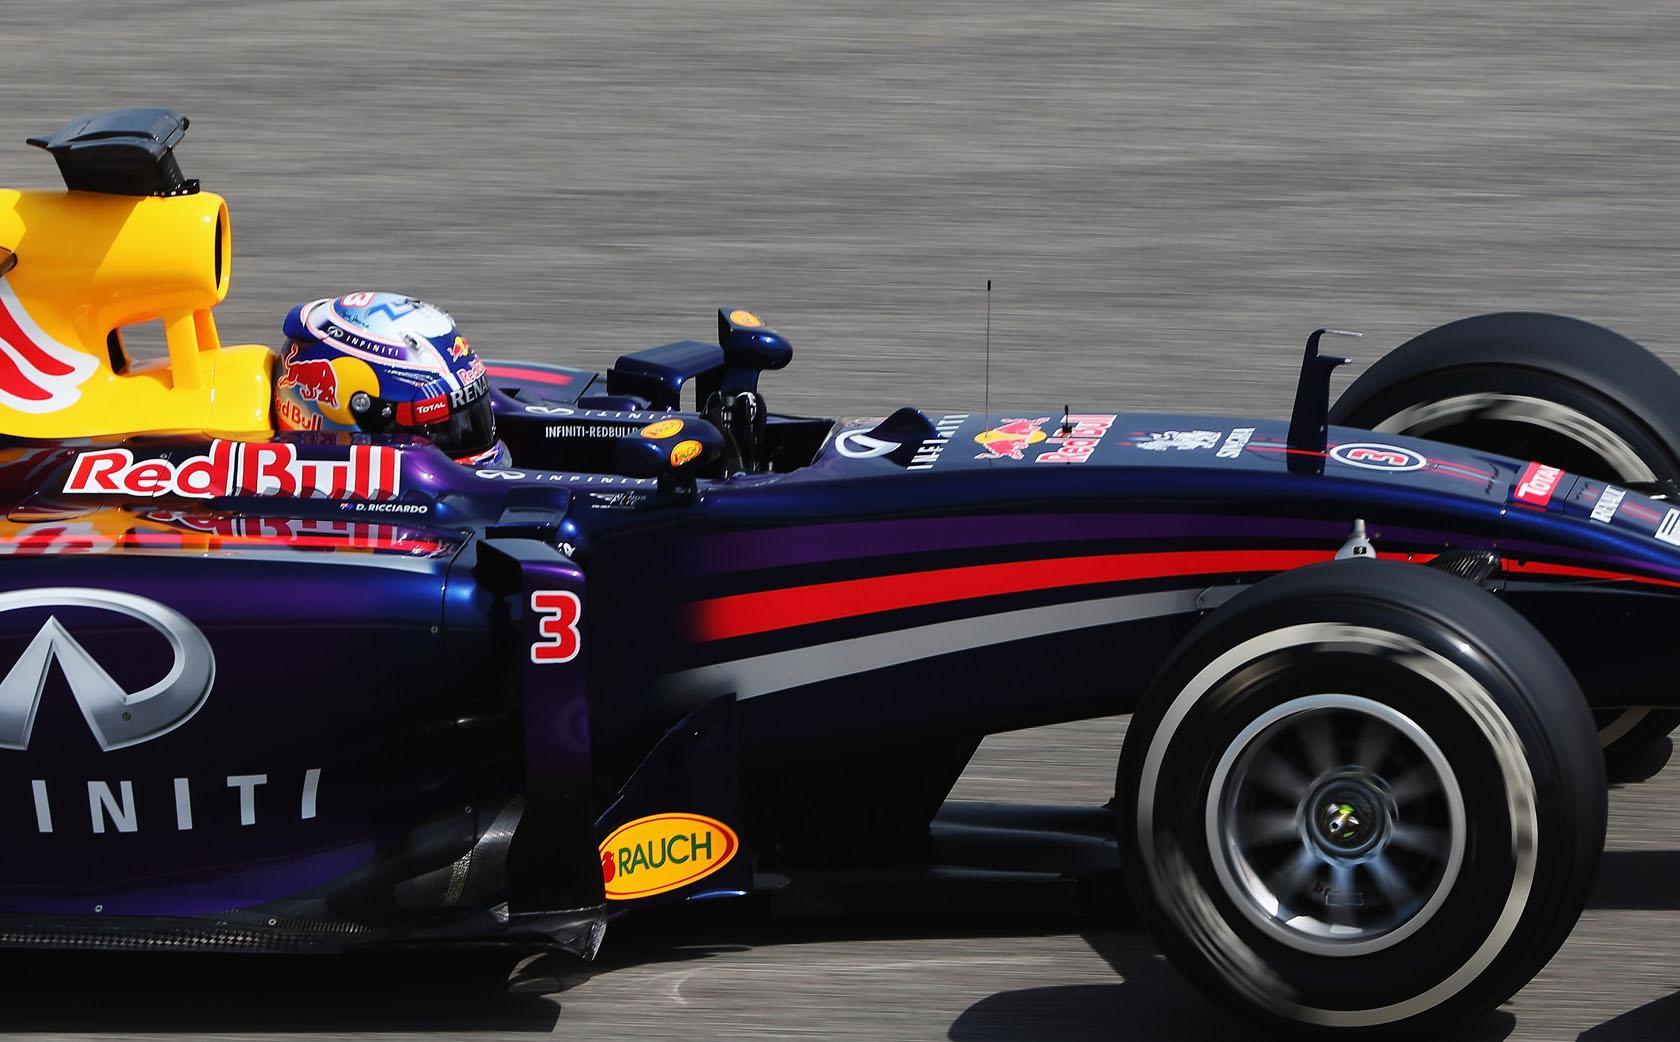 Valami el(be)indult a Red Bull-nál: Ricciardo boldog